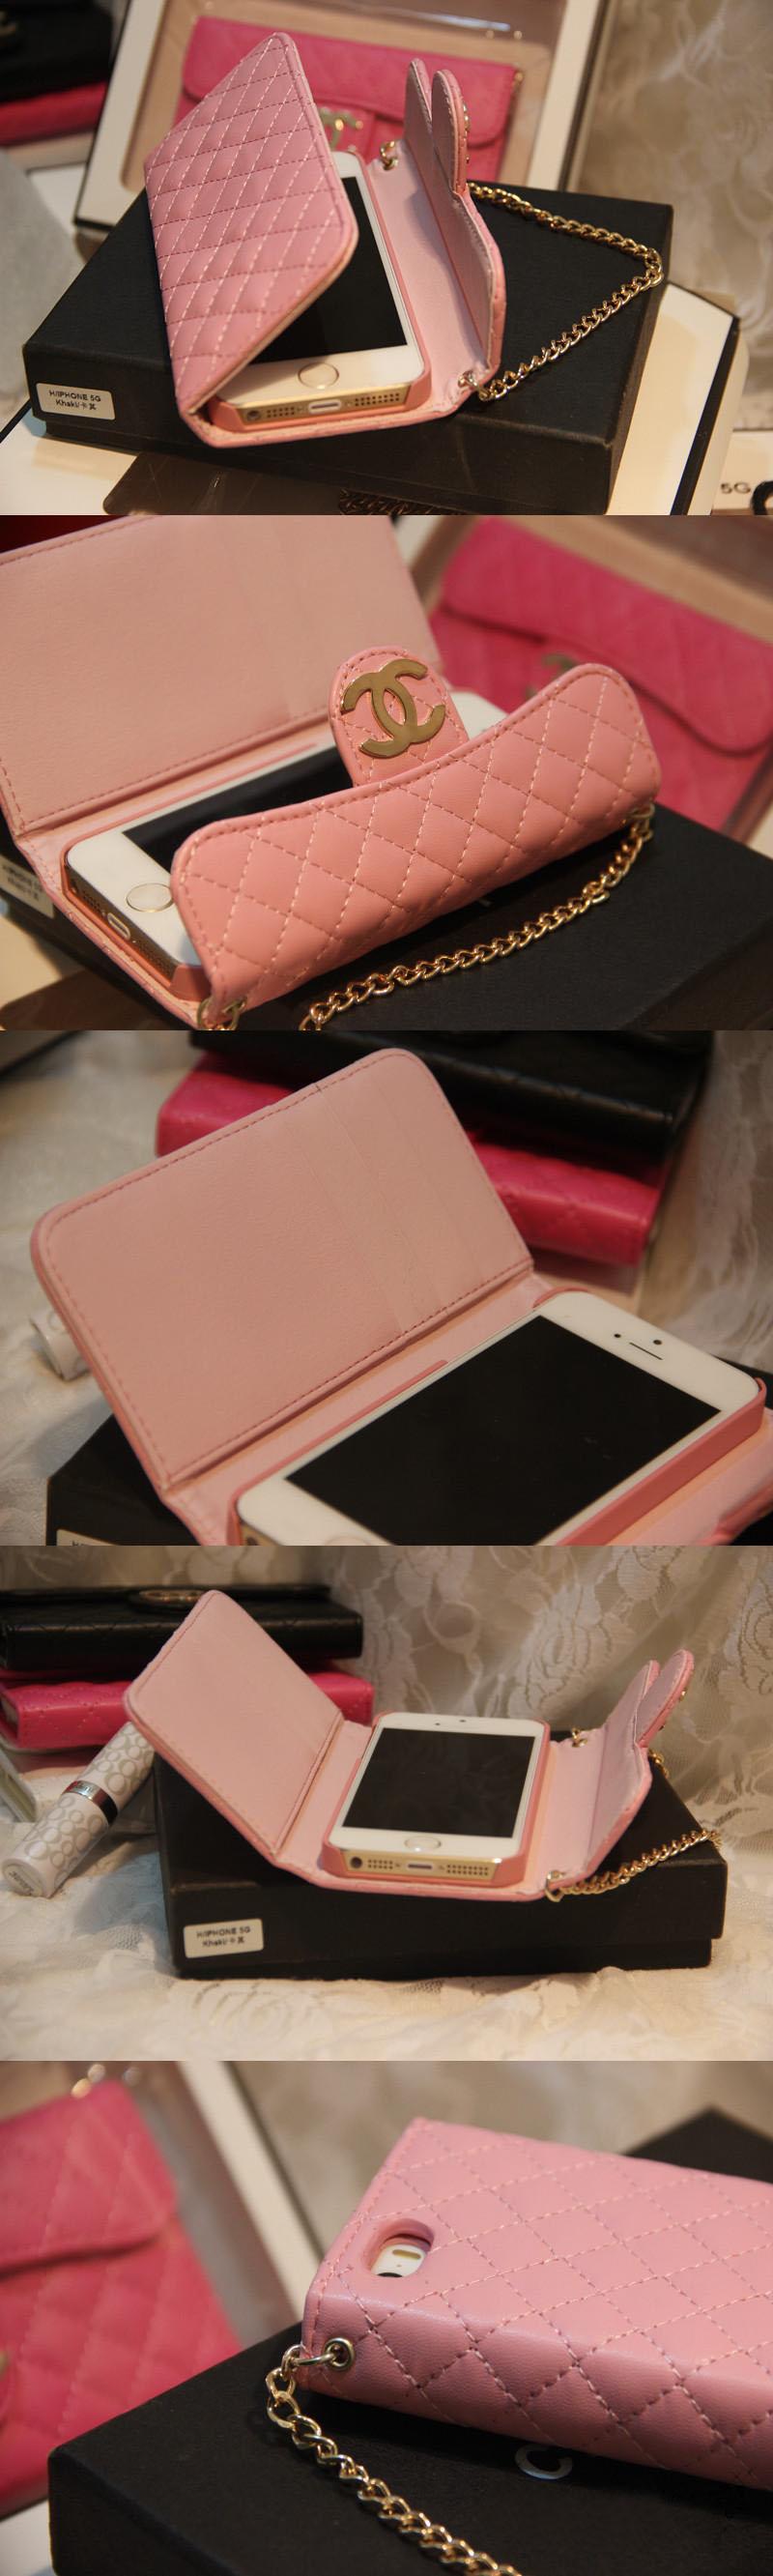 iphone hülle designen iphone hüllen bestellen Chanel iphone6 plus hülle iphone 6 weiß handy hülle bedrucken hülle iphone hardca6 elbst gestalten hülle i phone handy hardca6 elbst gestalten